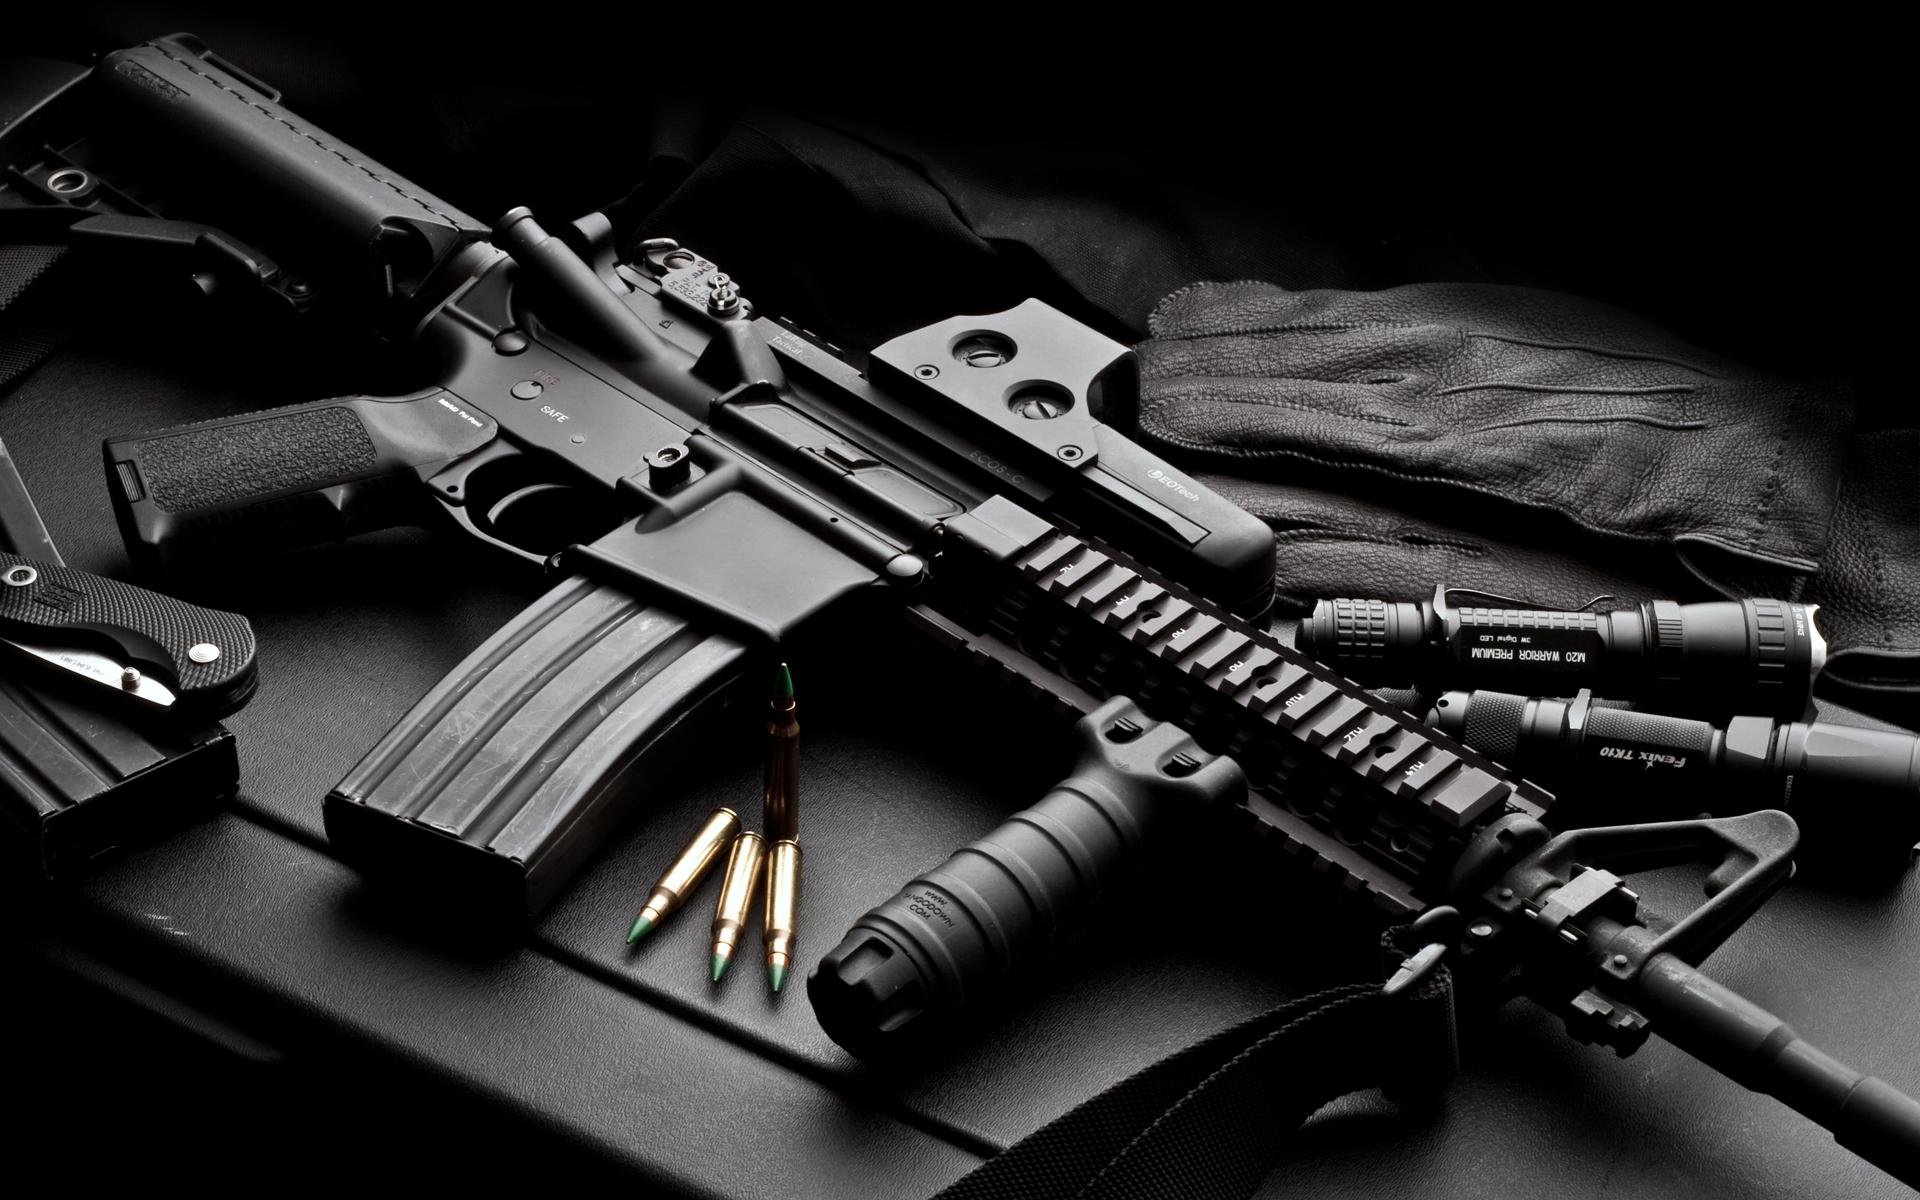 Machine gun Gun Bullet Photography 1920x1200 hdweweb4com 1920x1200